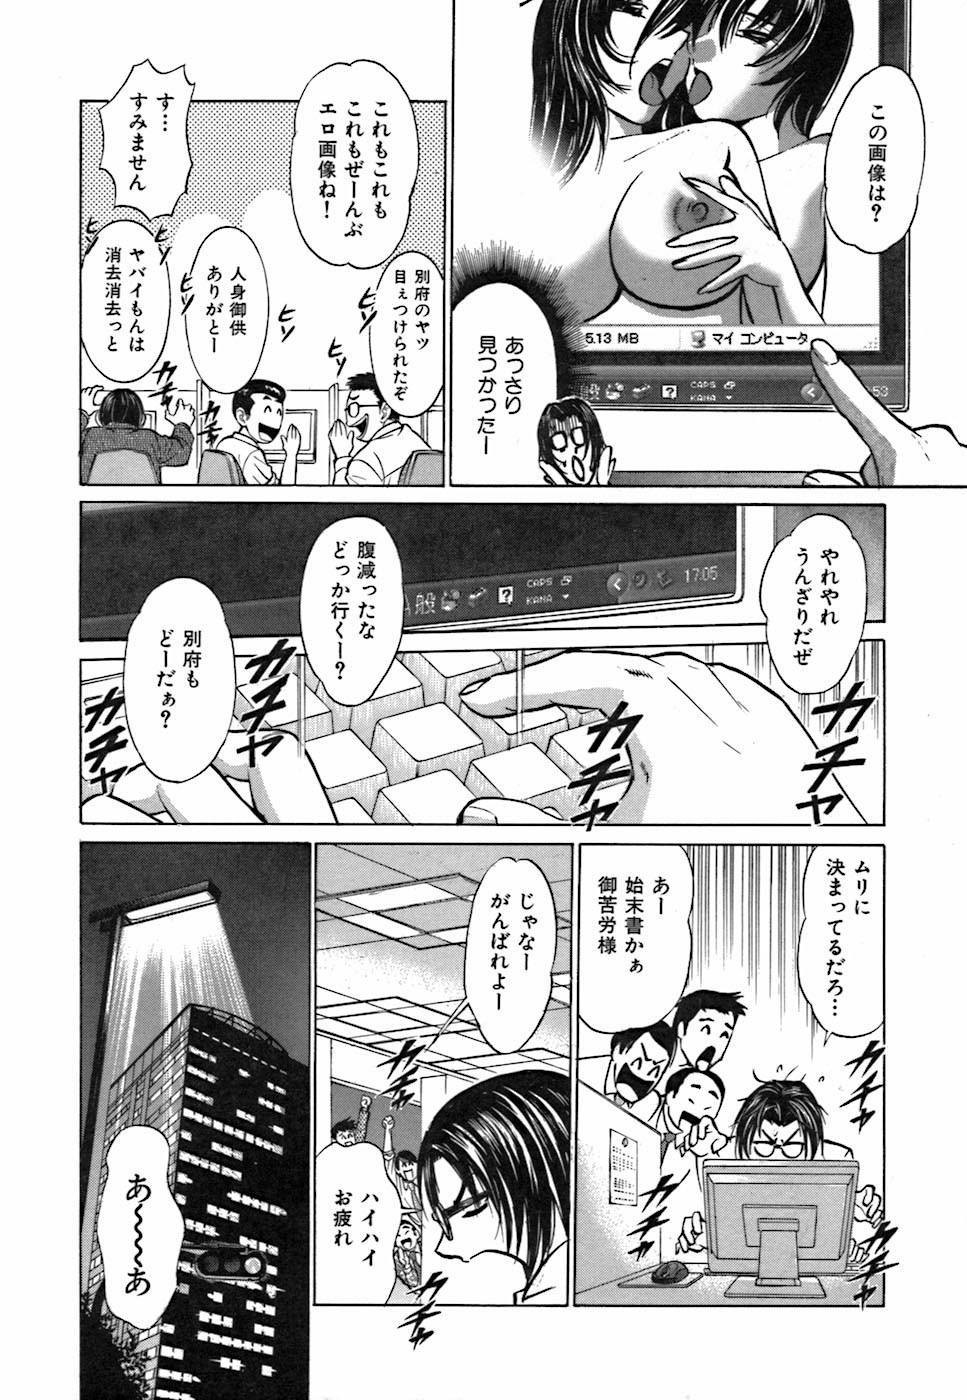 Kimi ga Nozomu Katachi | Appearance for which you hope 9